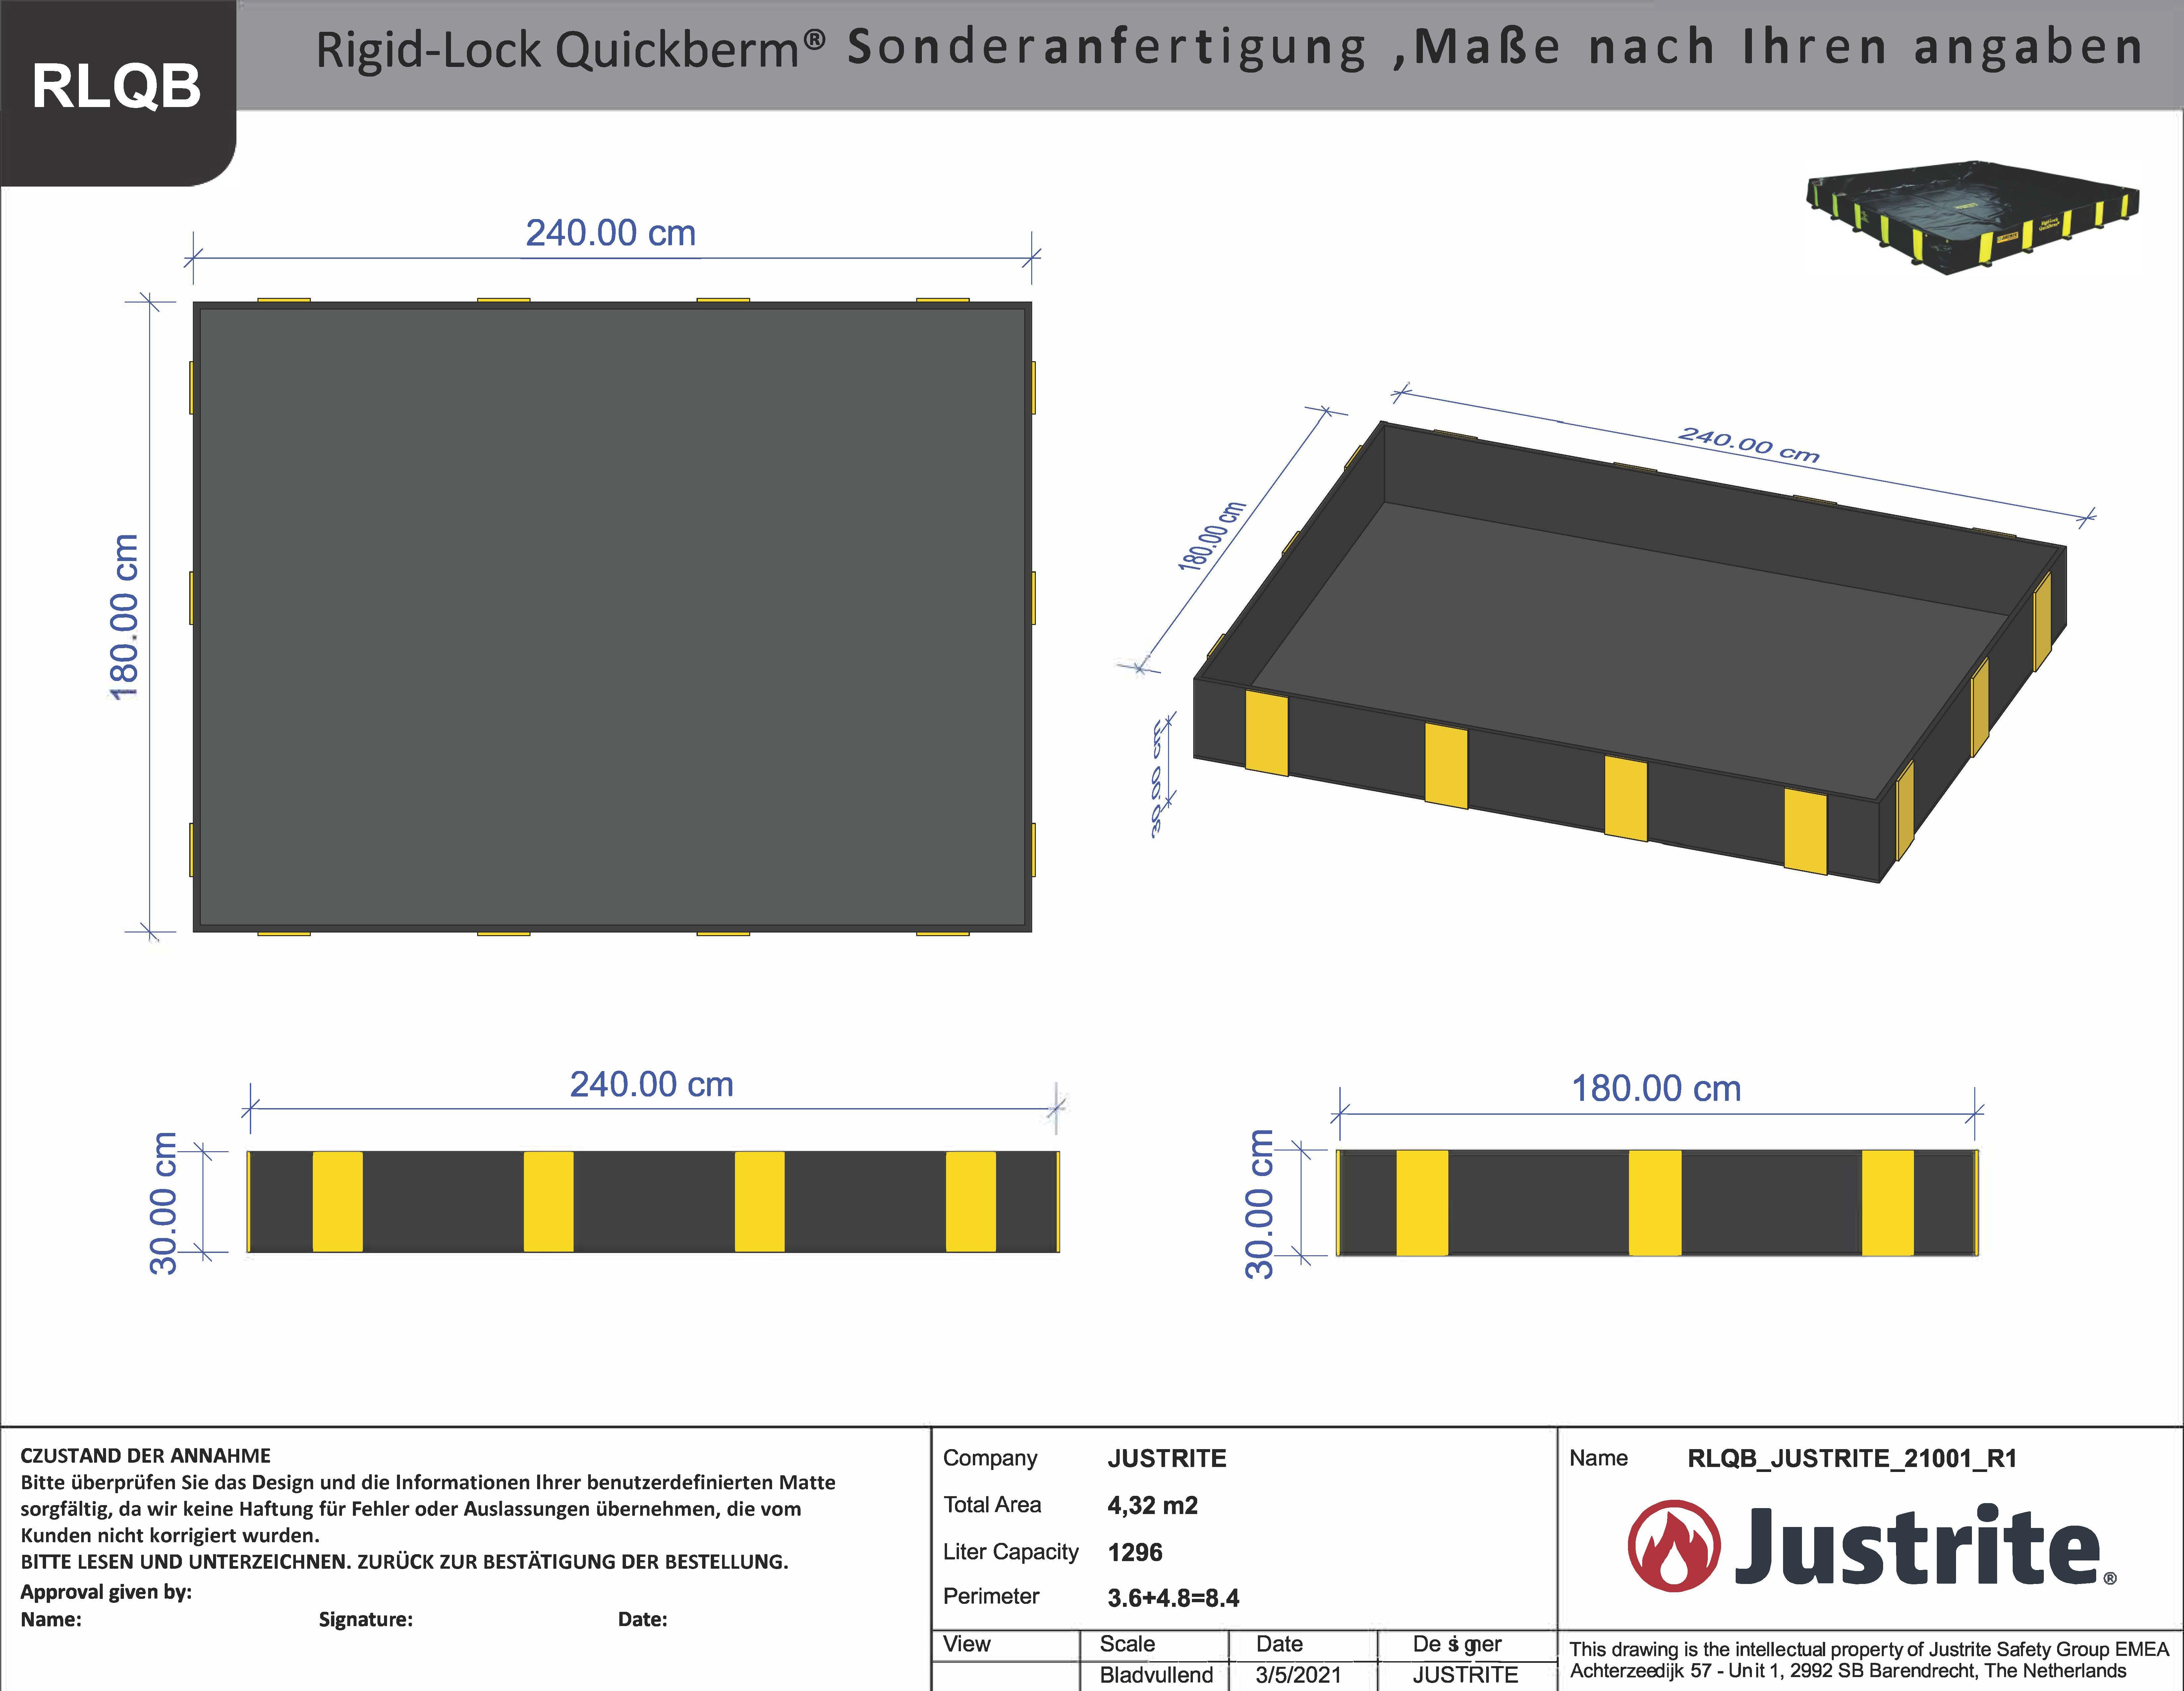 RIGID-LOCK-QUICKBERM-nach-Mass-RLQB_JUSTRITE_21001_R1